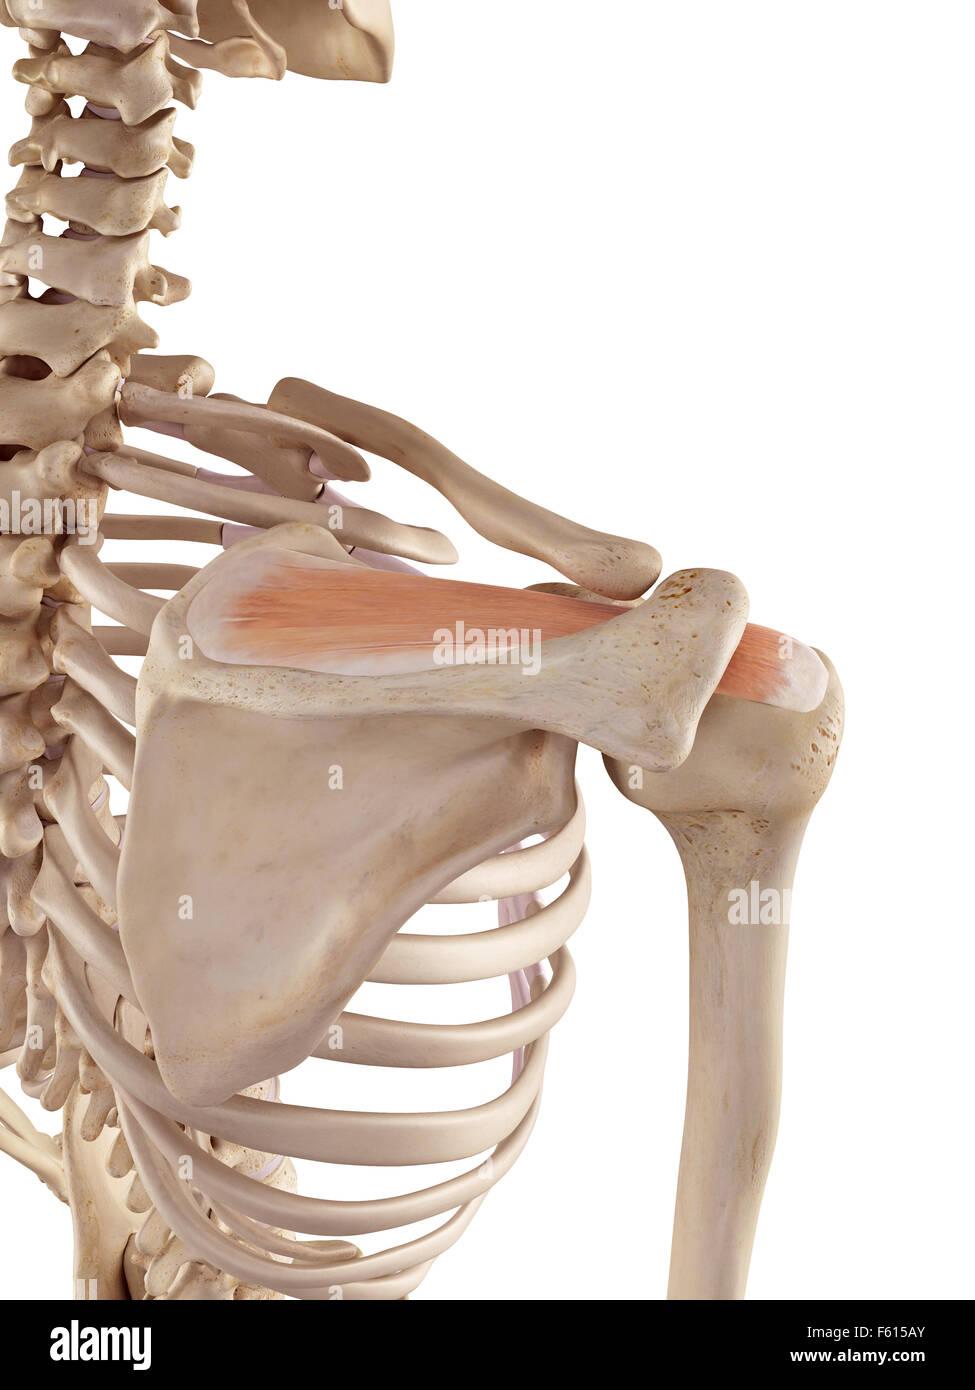 Supraspinatus Muscle Stock Photos Supraspinatus Muscle Stock